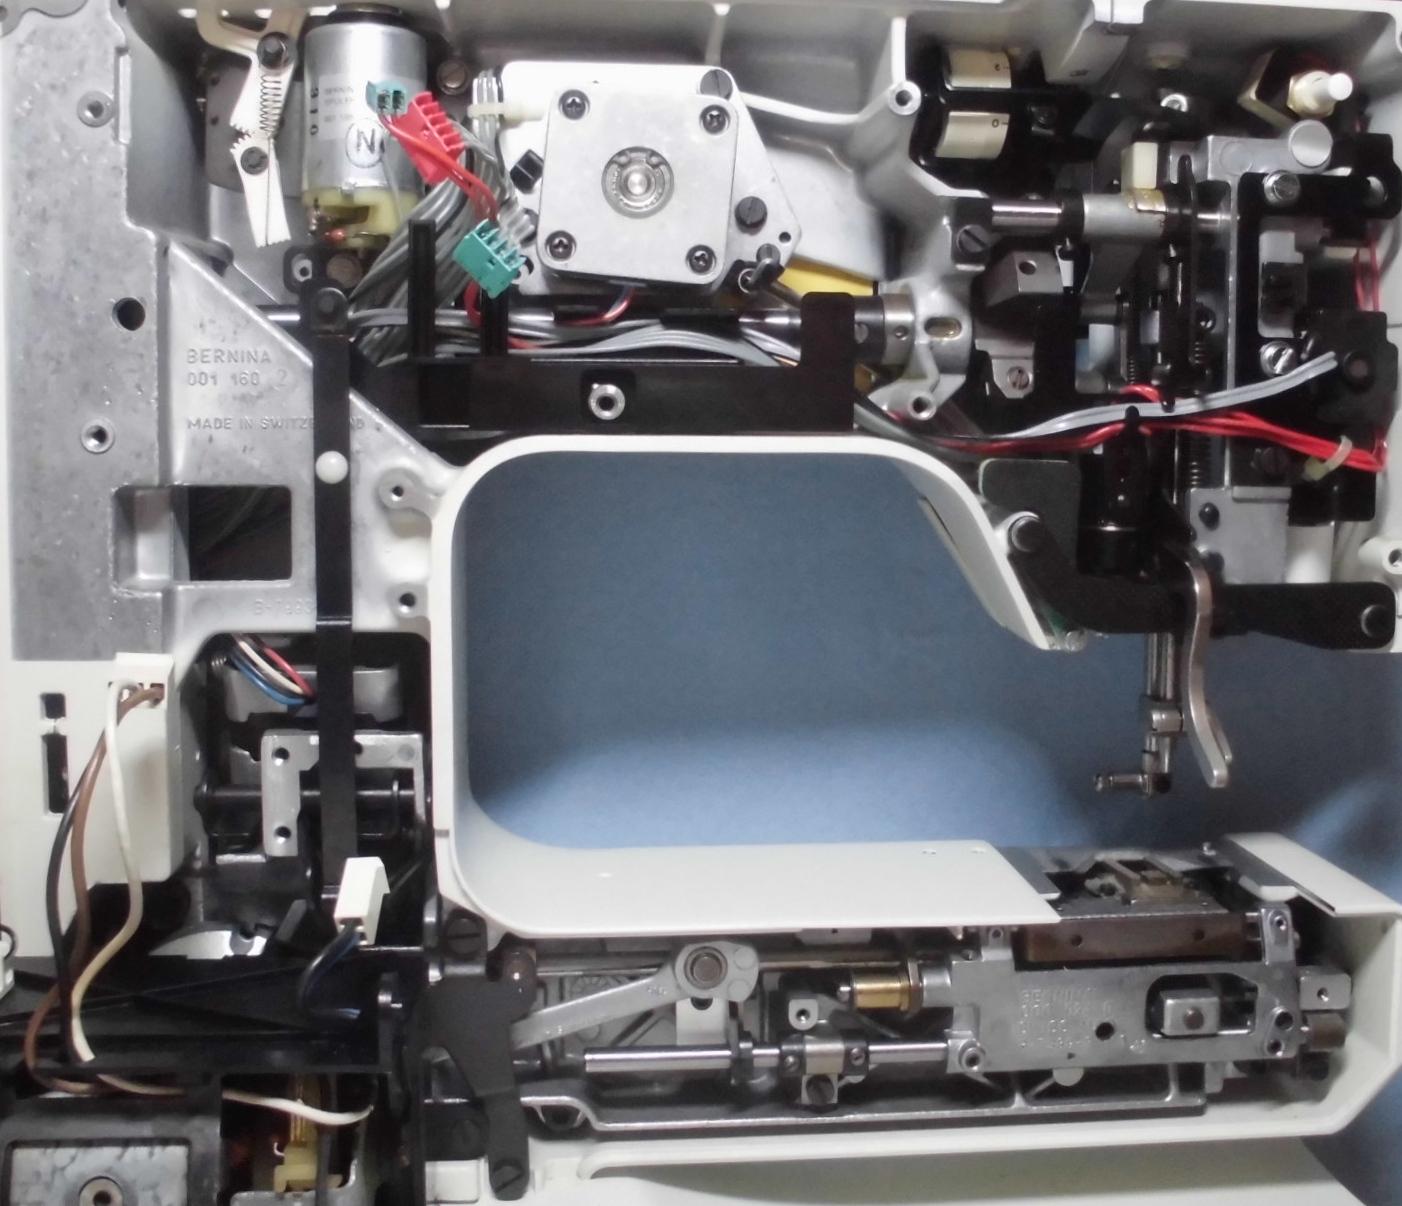 RICCARミシンHolidaynu1240の分解オーバーホールメンテナンス修理